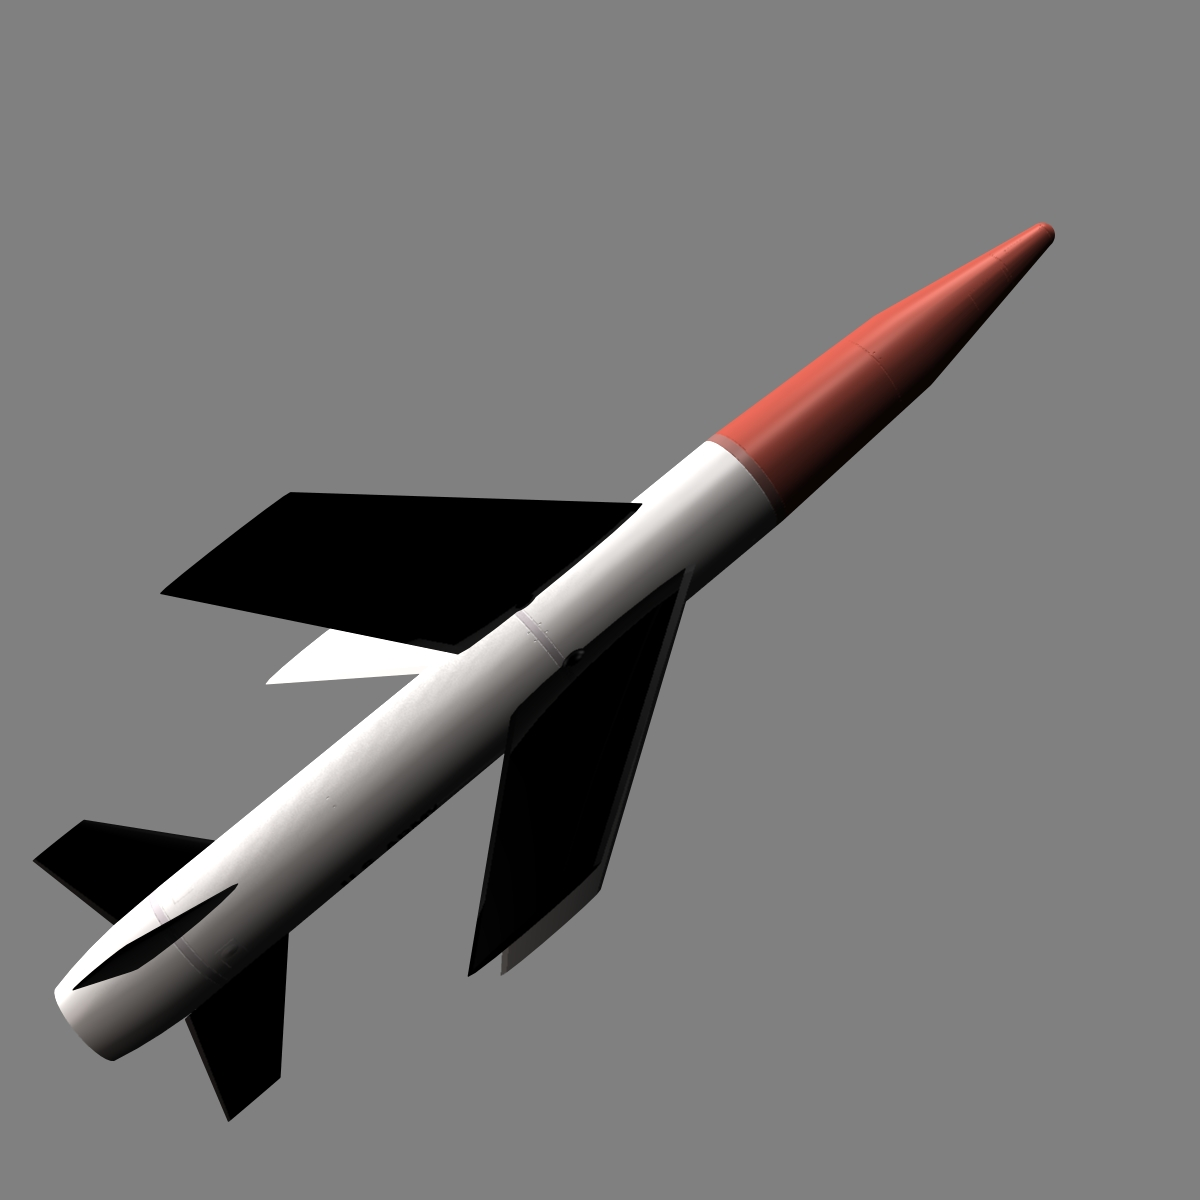 us mgm-18a raketa za lakros 3d model 3ds dxf cob x drugi obj 136522